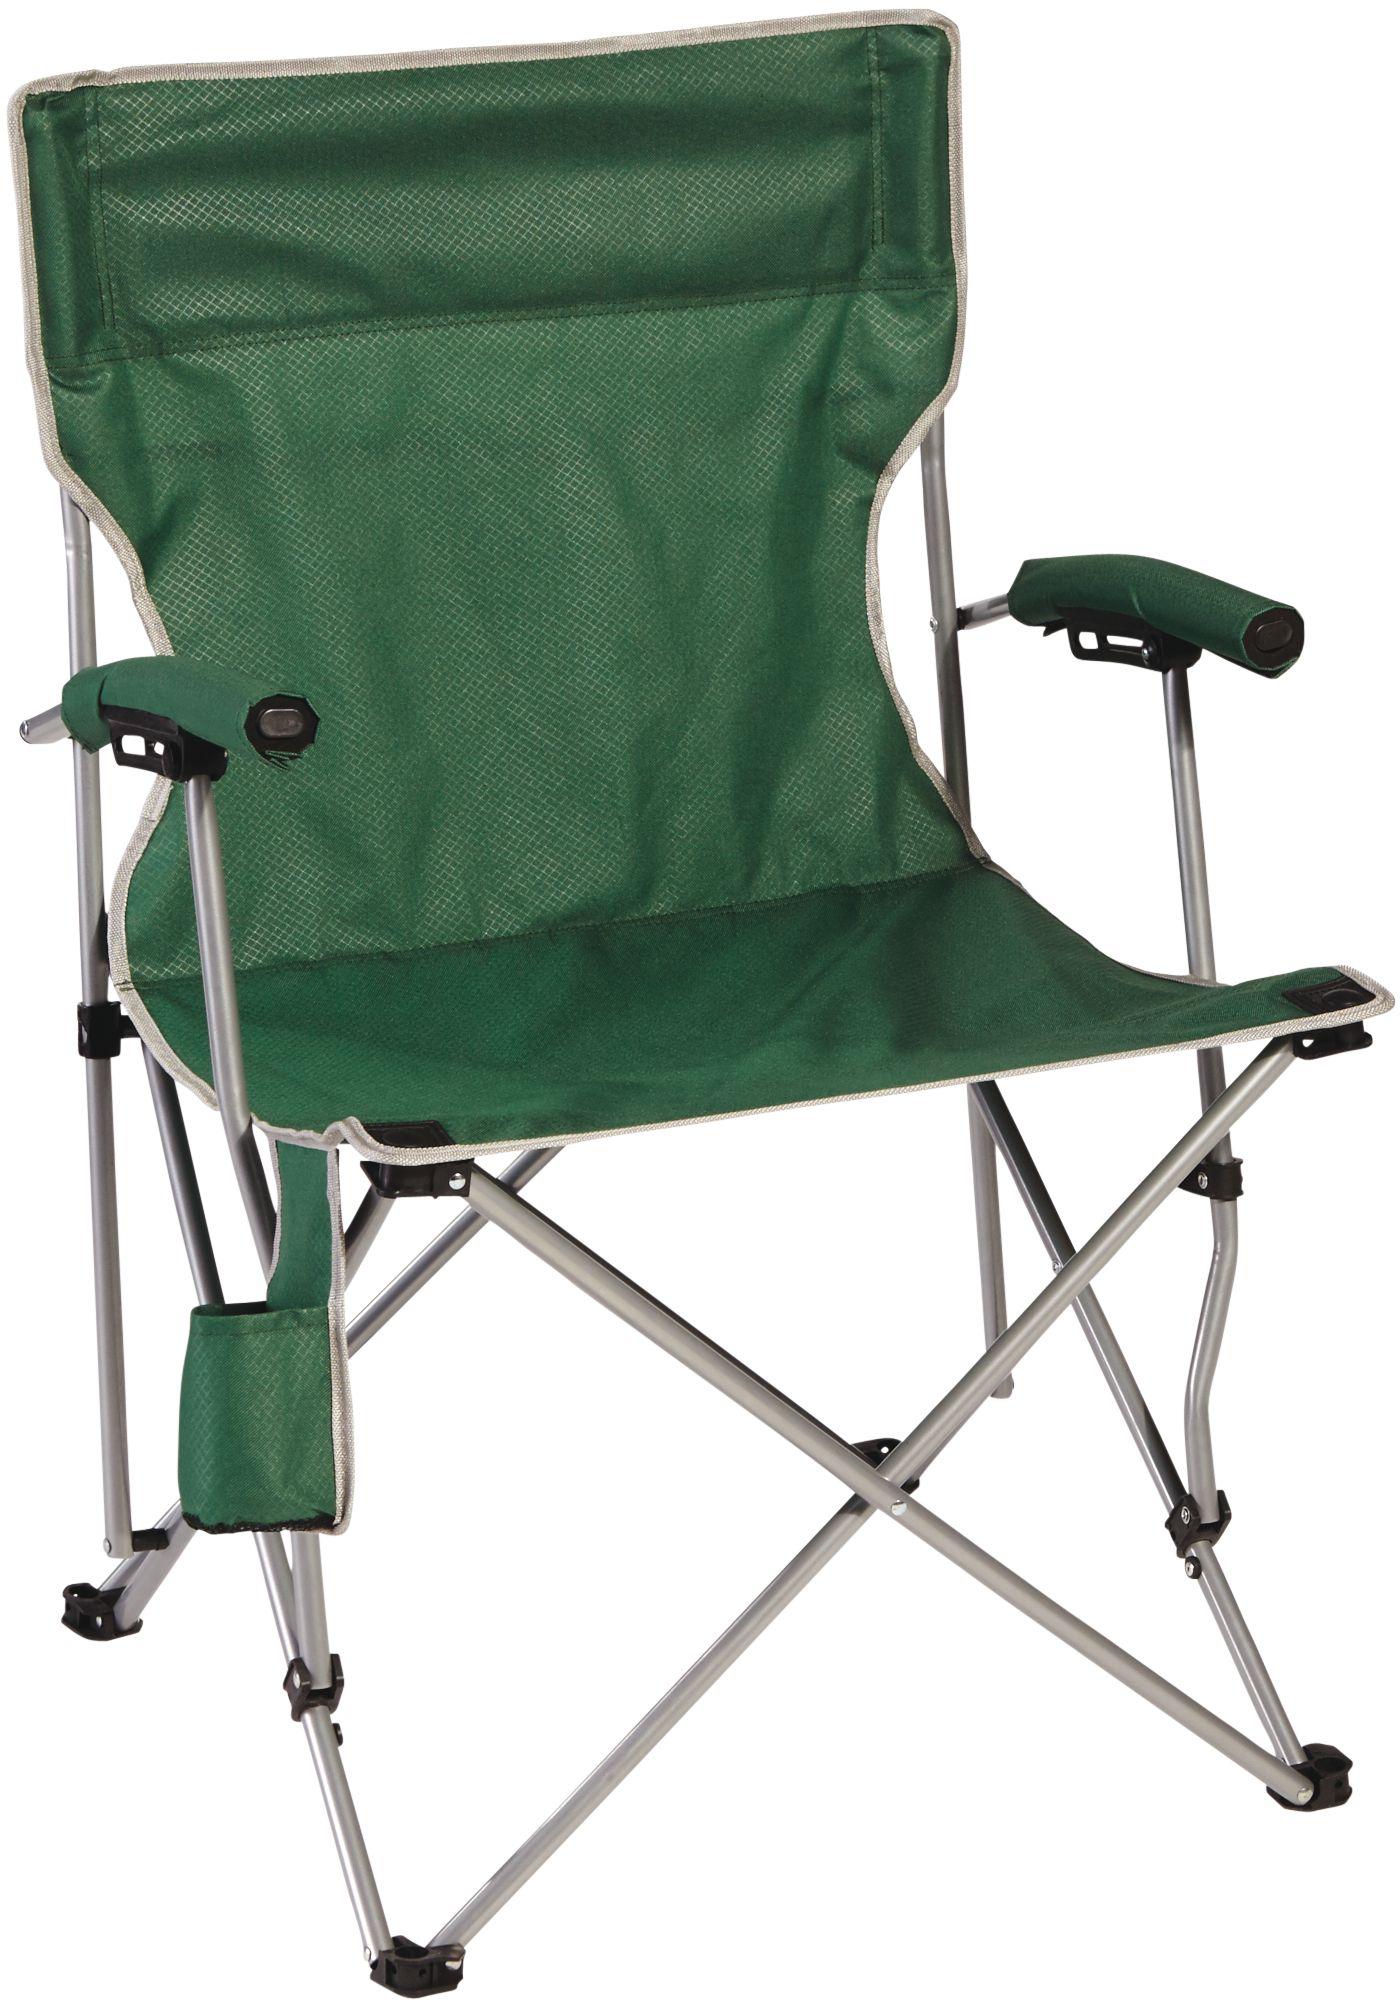 kijaro dual lock folding chair xxl the barcelona green camping chairs | dick's sporting goods